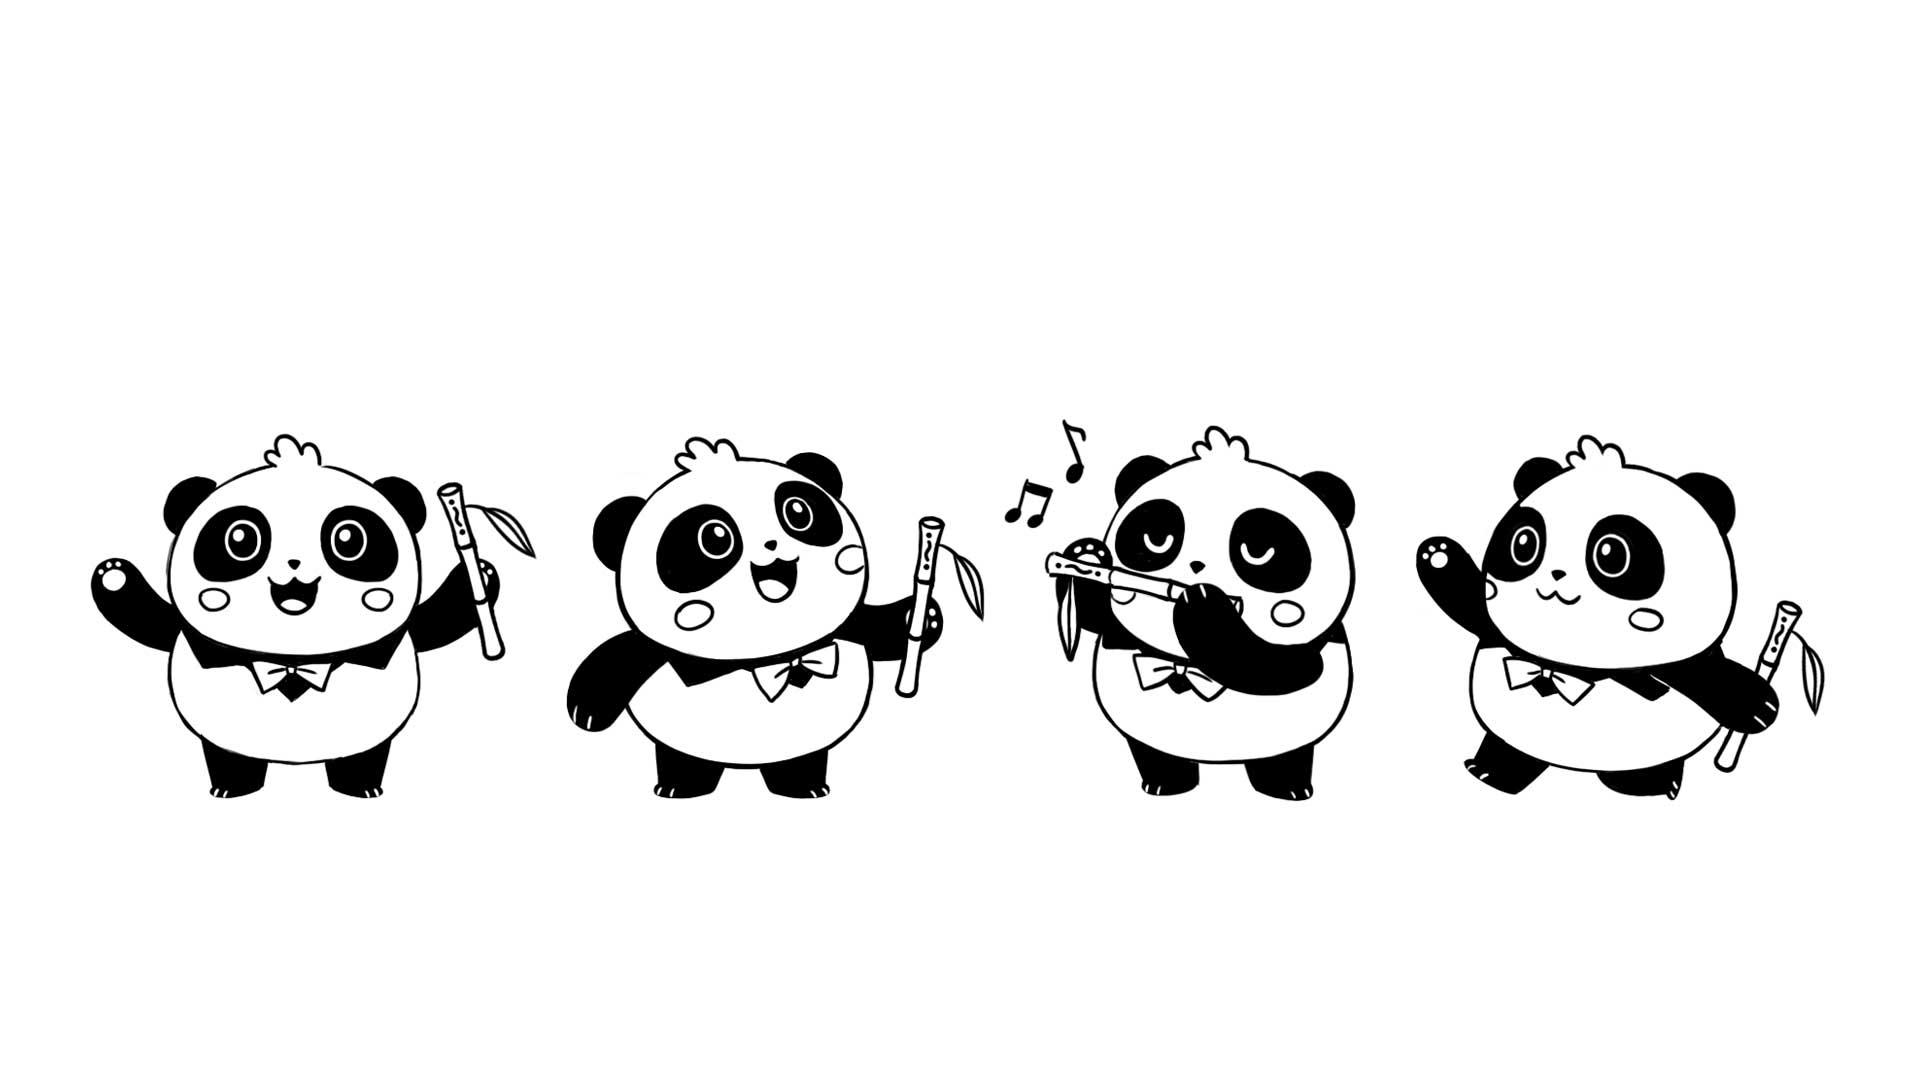 3D-Animation-PandaHouse-Hologram-7